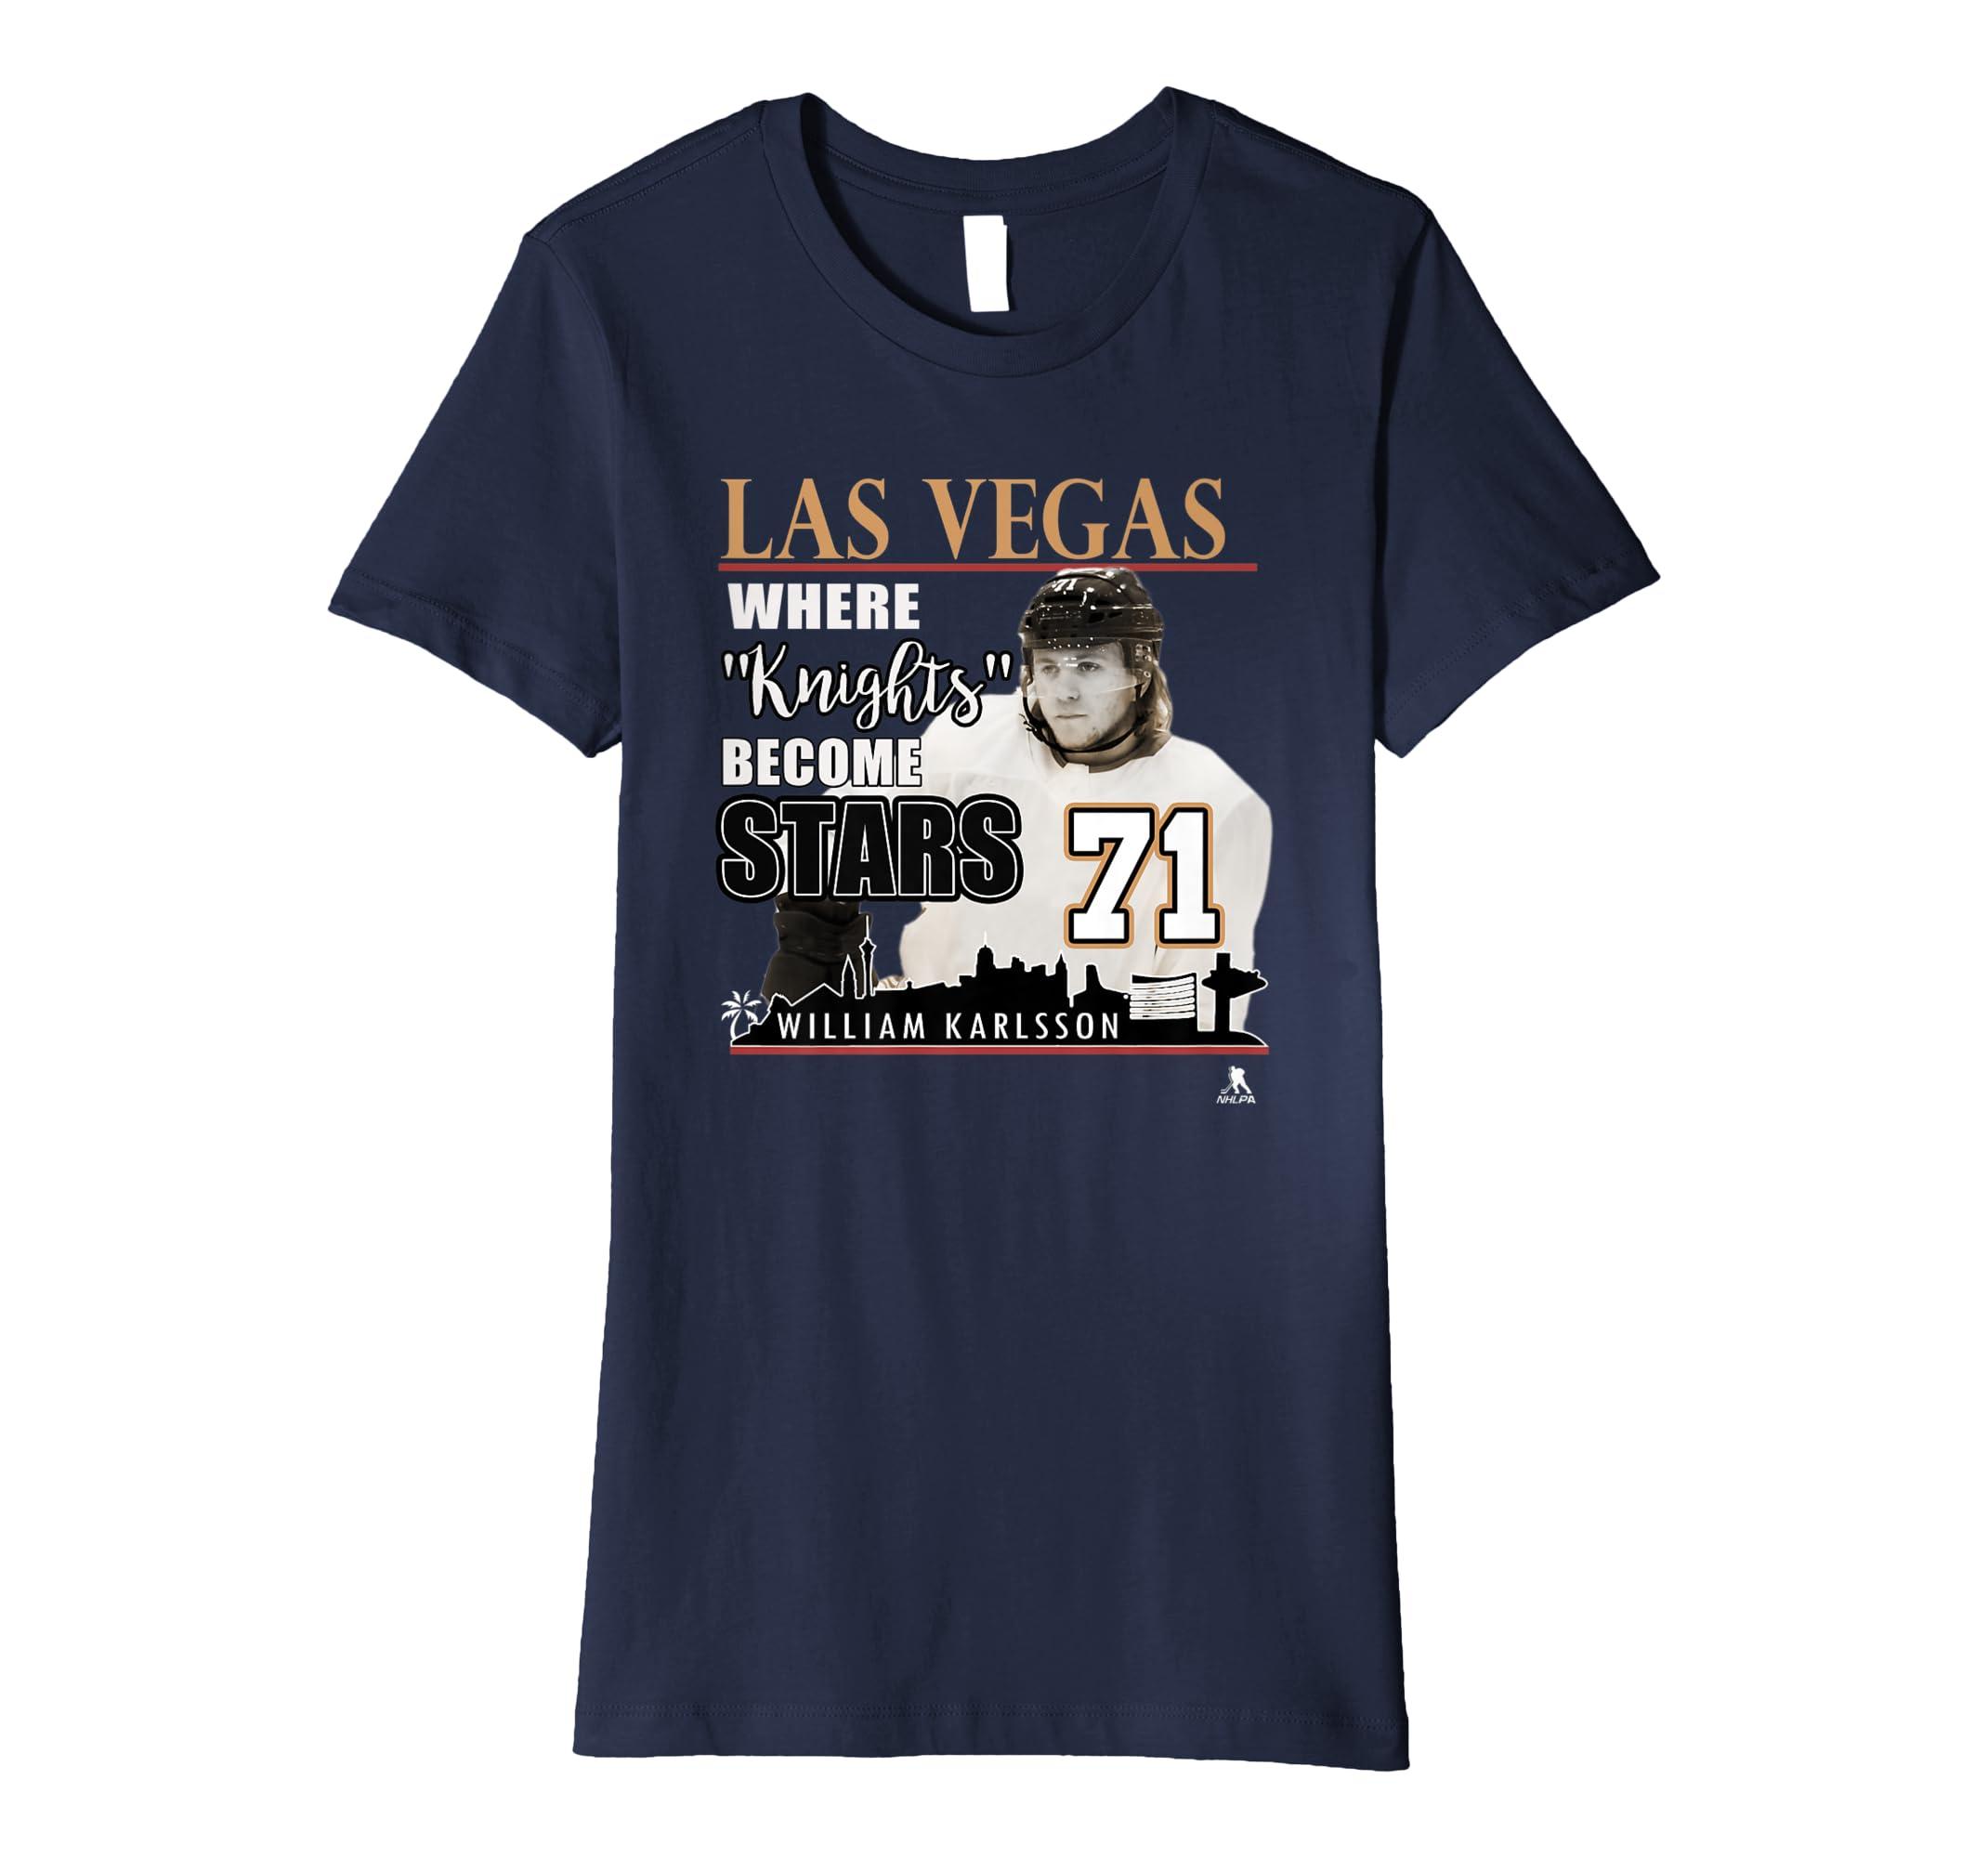 reputable site 42538 28bda Amazon.com: Las Vegas Golden Knights - William Karlsson T ...